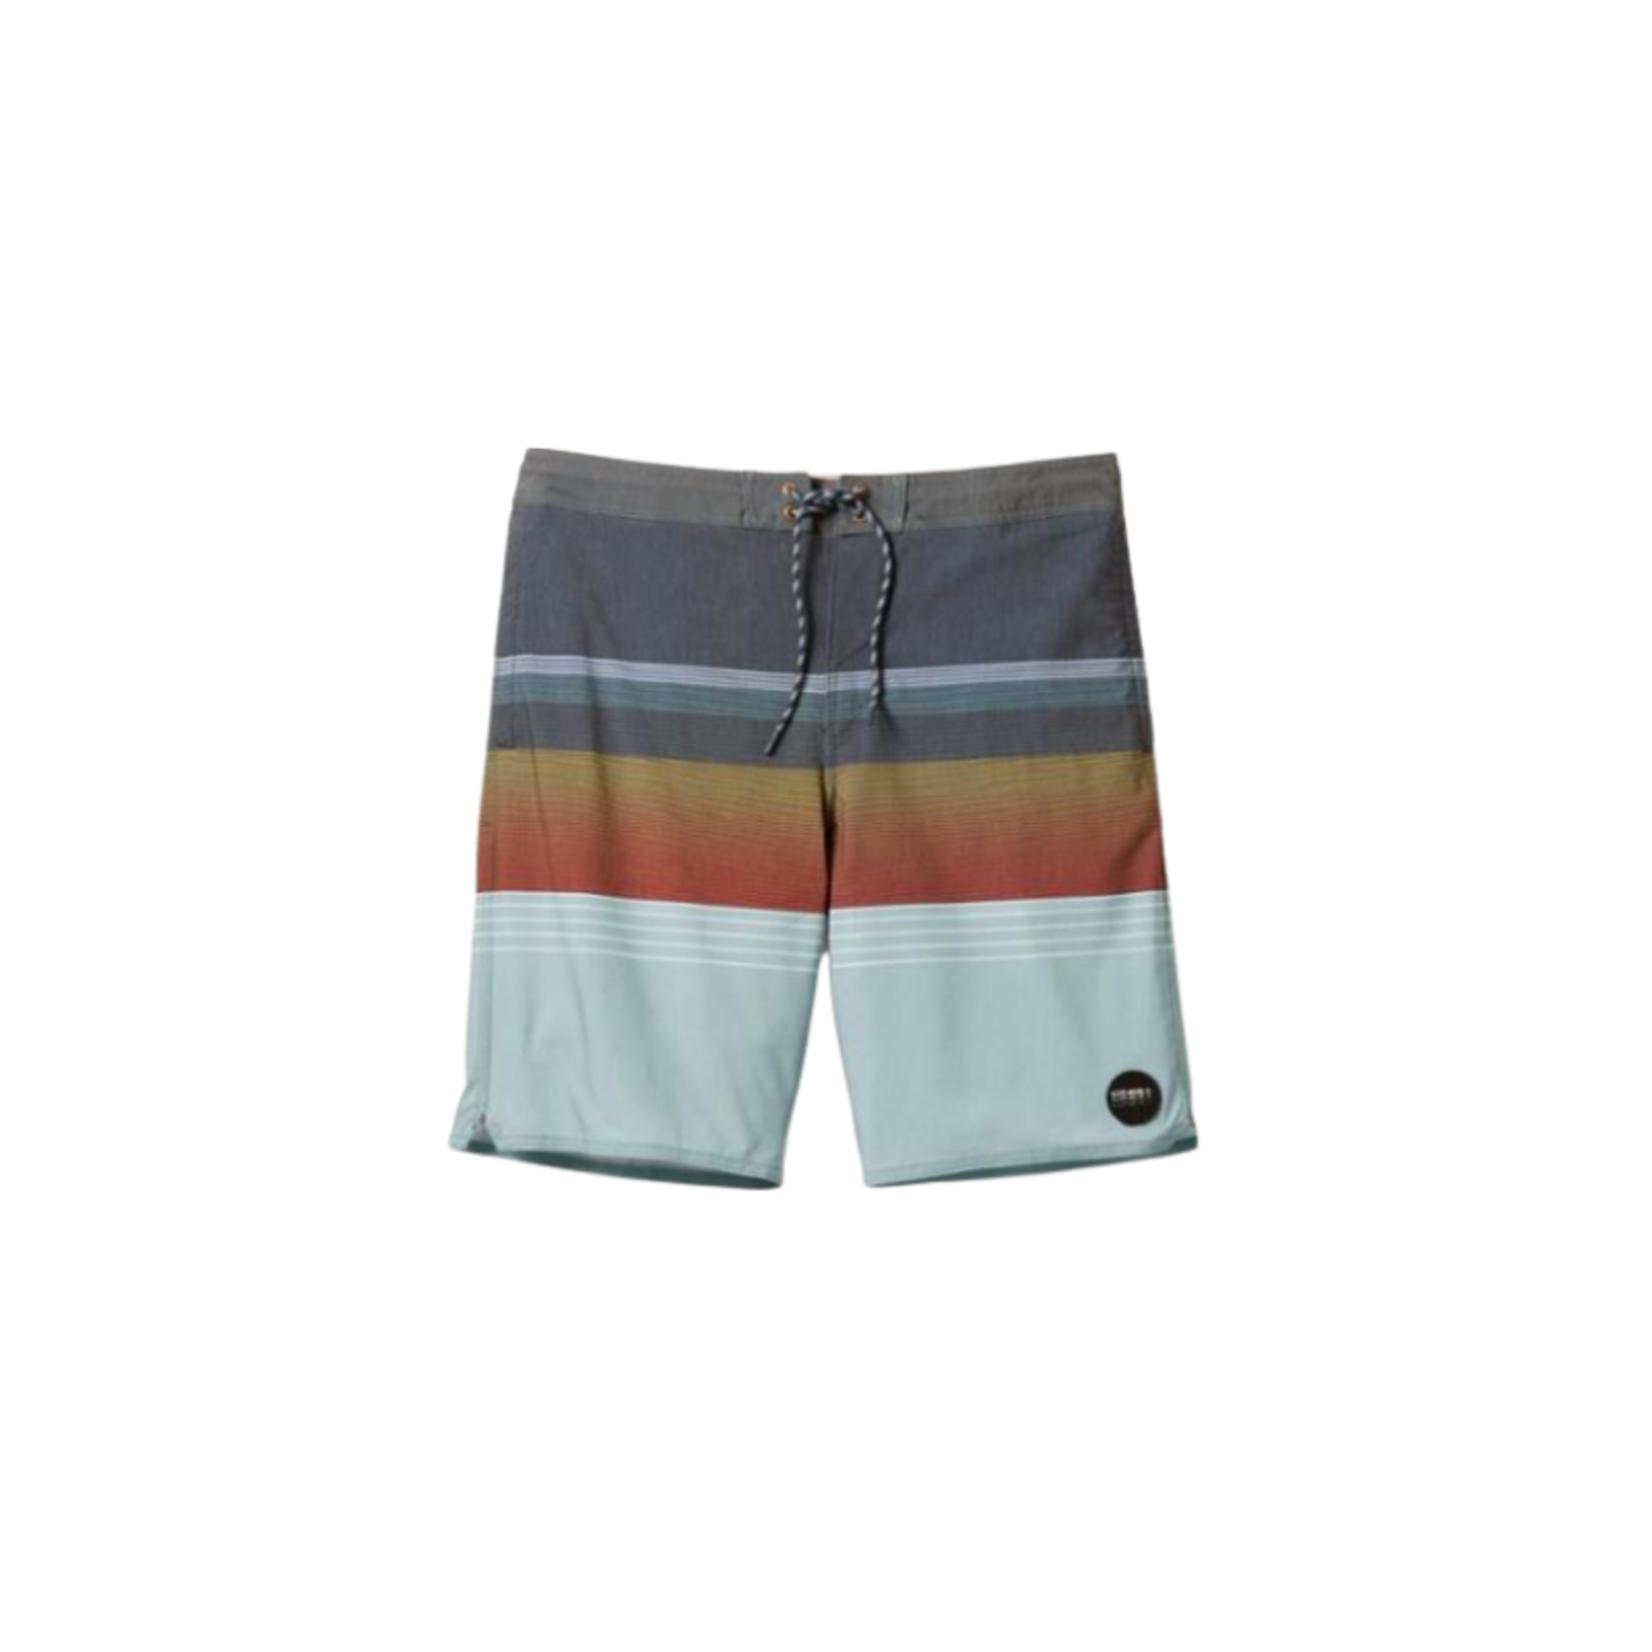 O'Neill O'Neill Men's Stripe Club Cruzer Board Shorts.